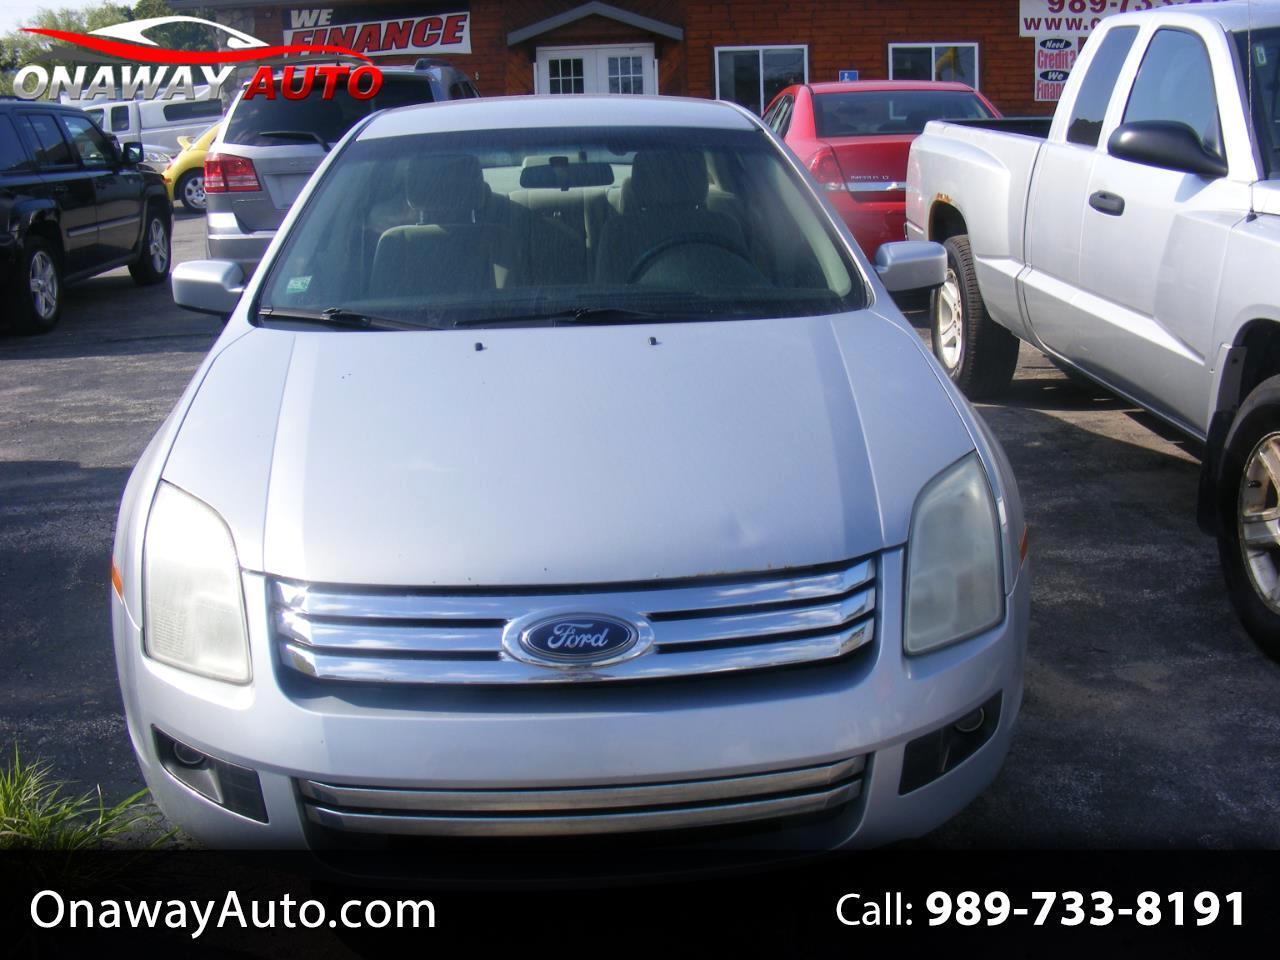 2006 Ford Fusion 4dr Sdn V6 SE